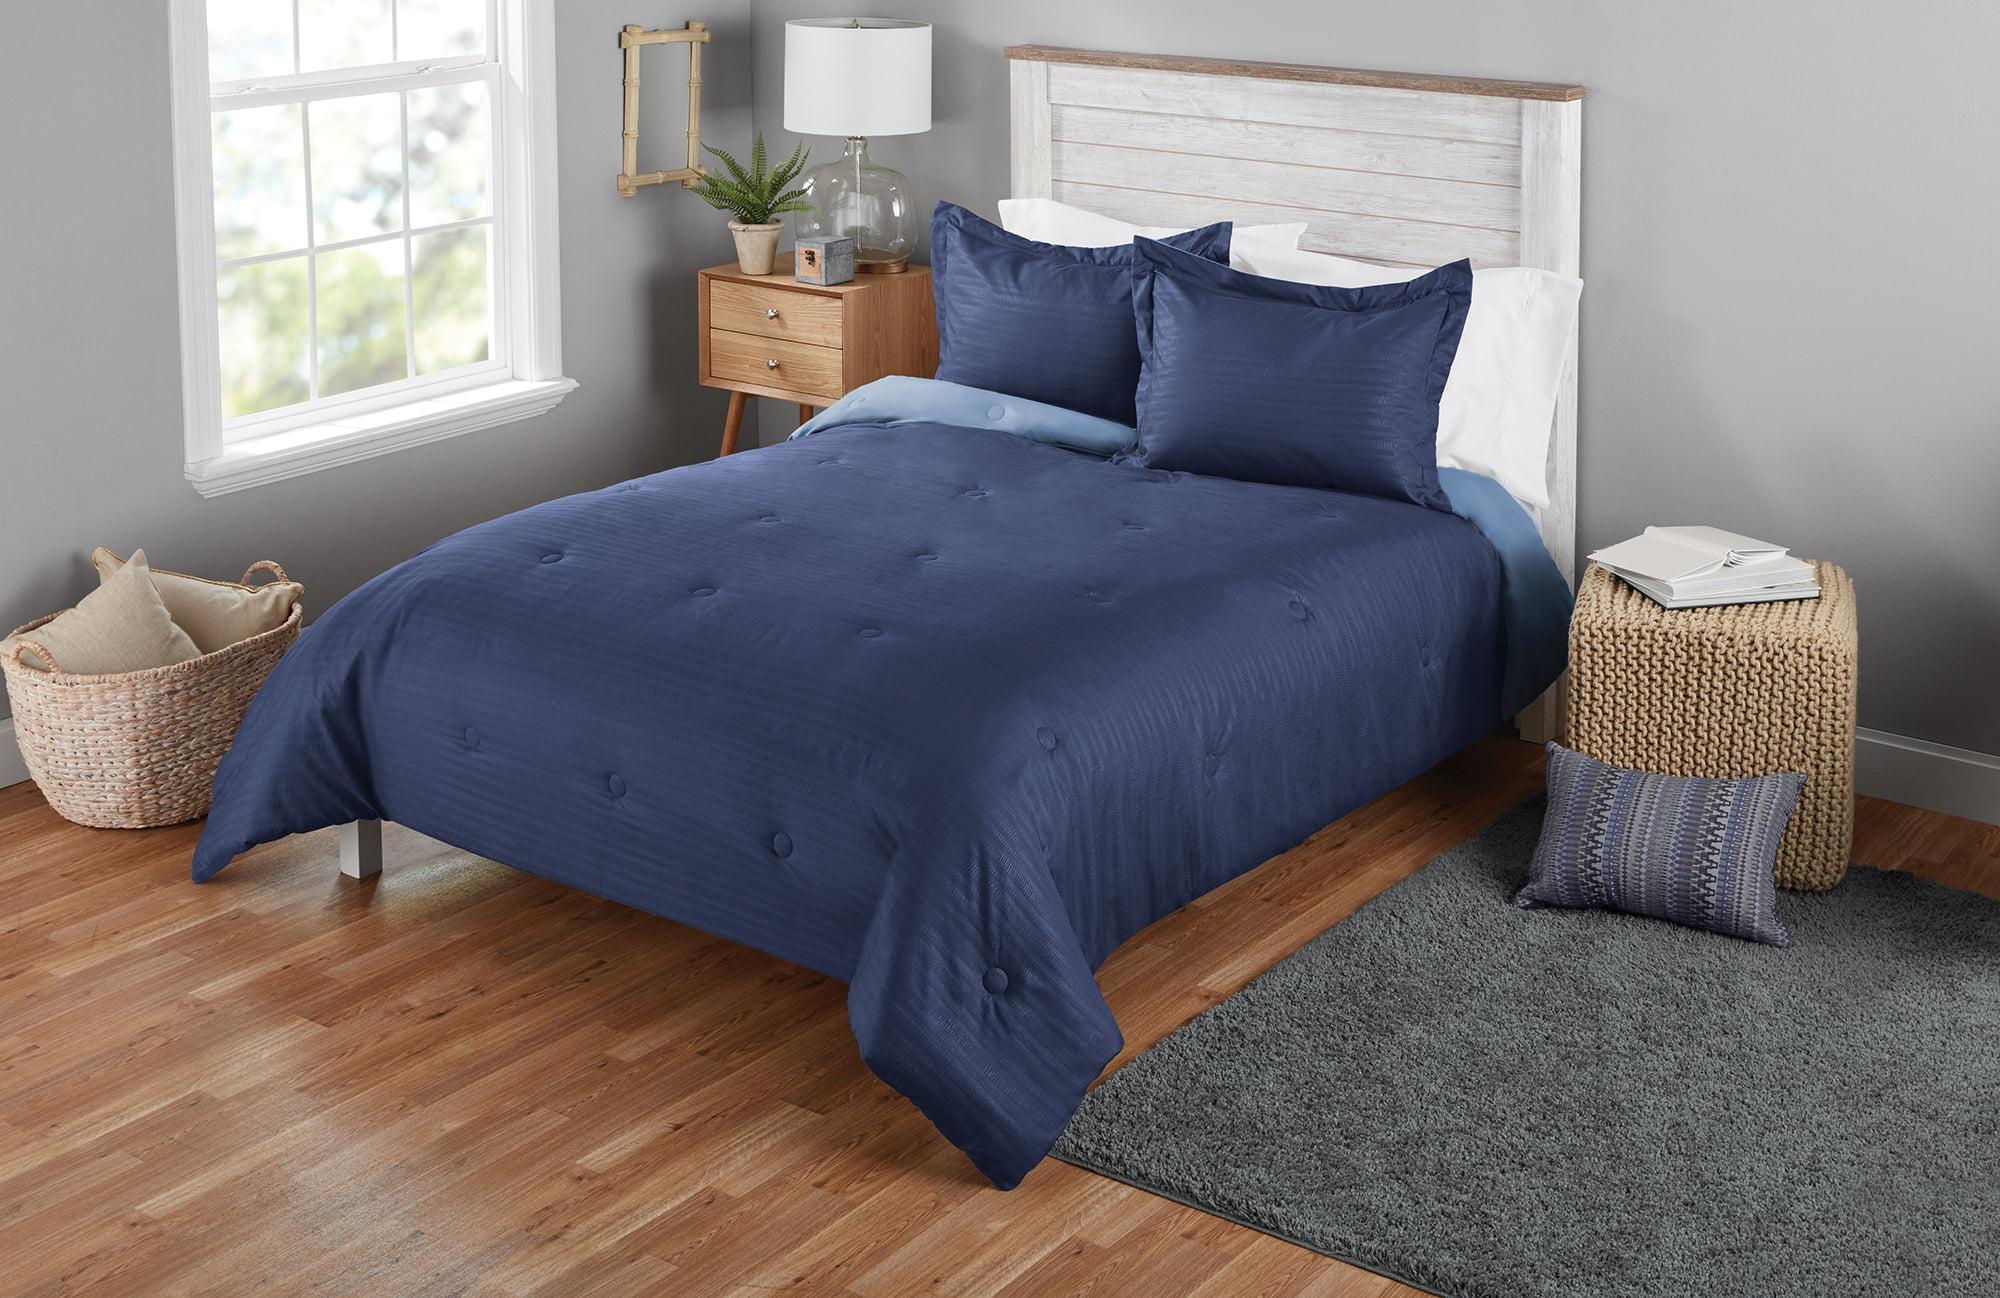 Mainstays Solid Seersucker Mini Comforter Sets by SUZHOU YUNKAI HOME TEXTILE CO., LTD